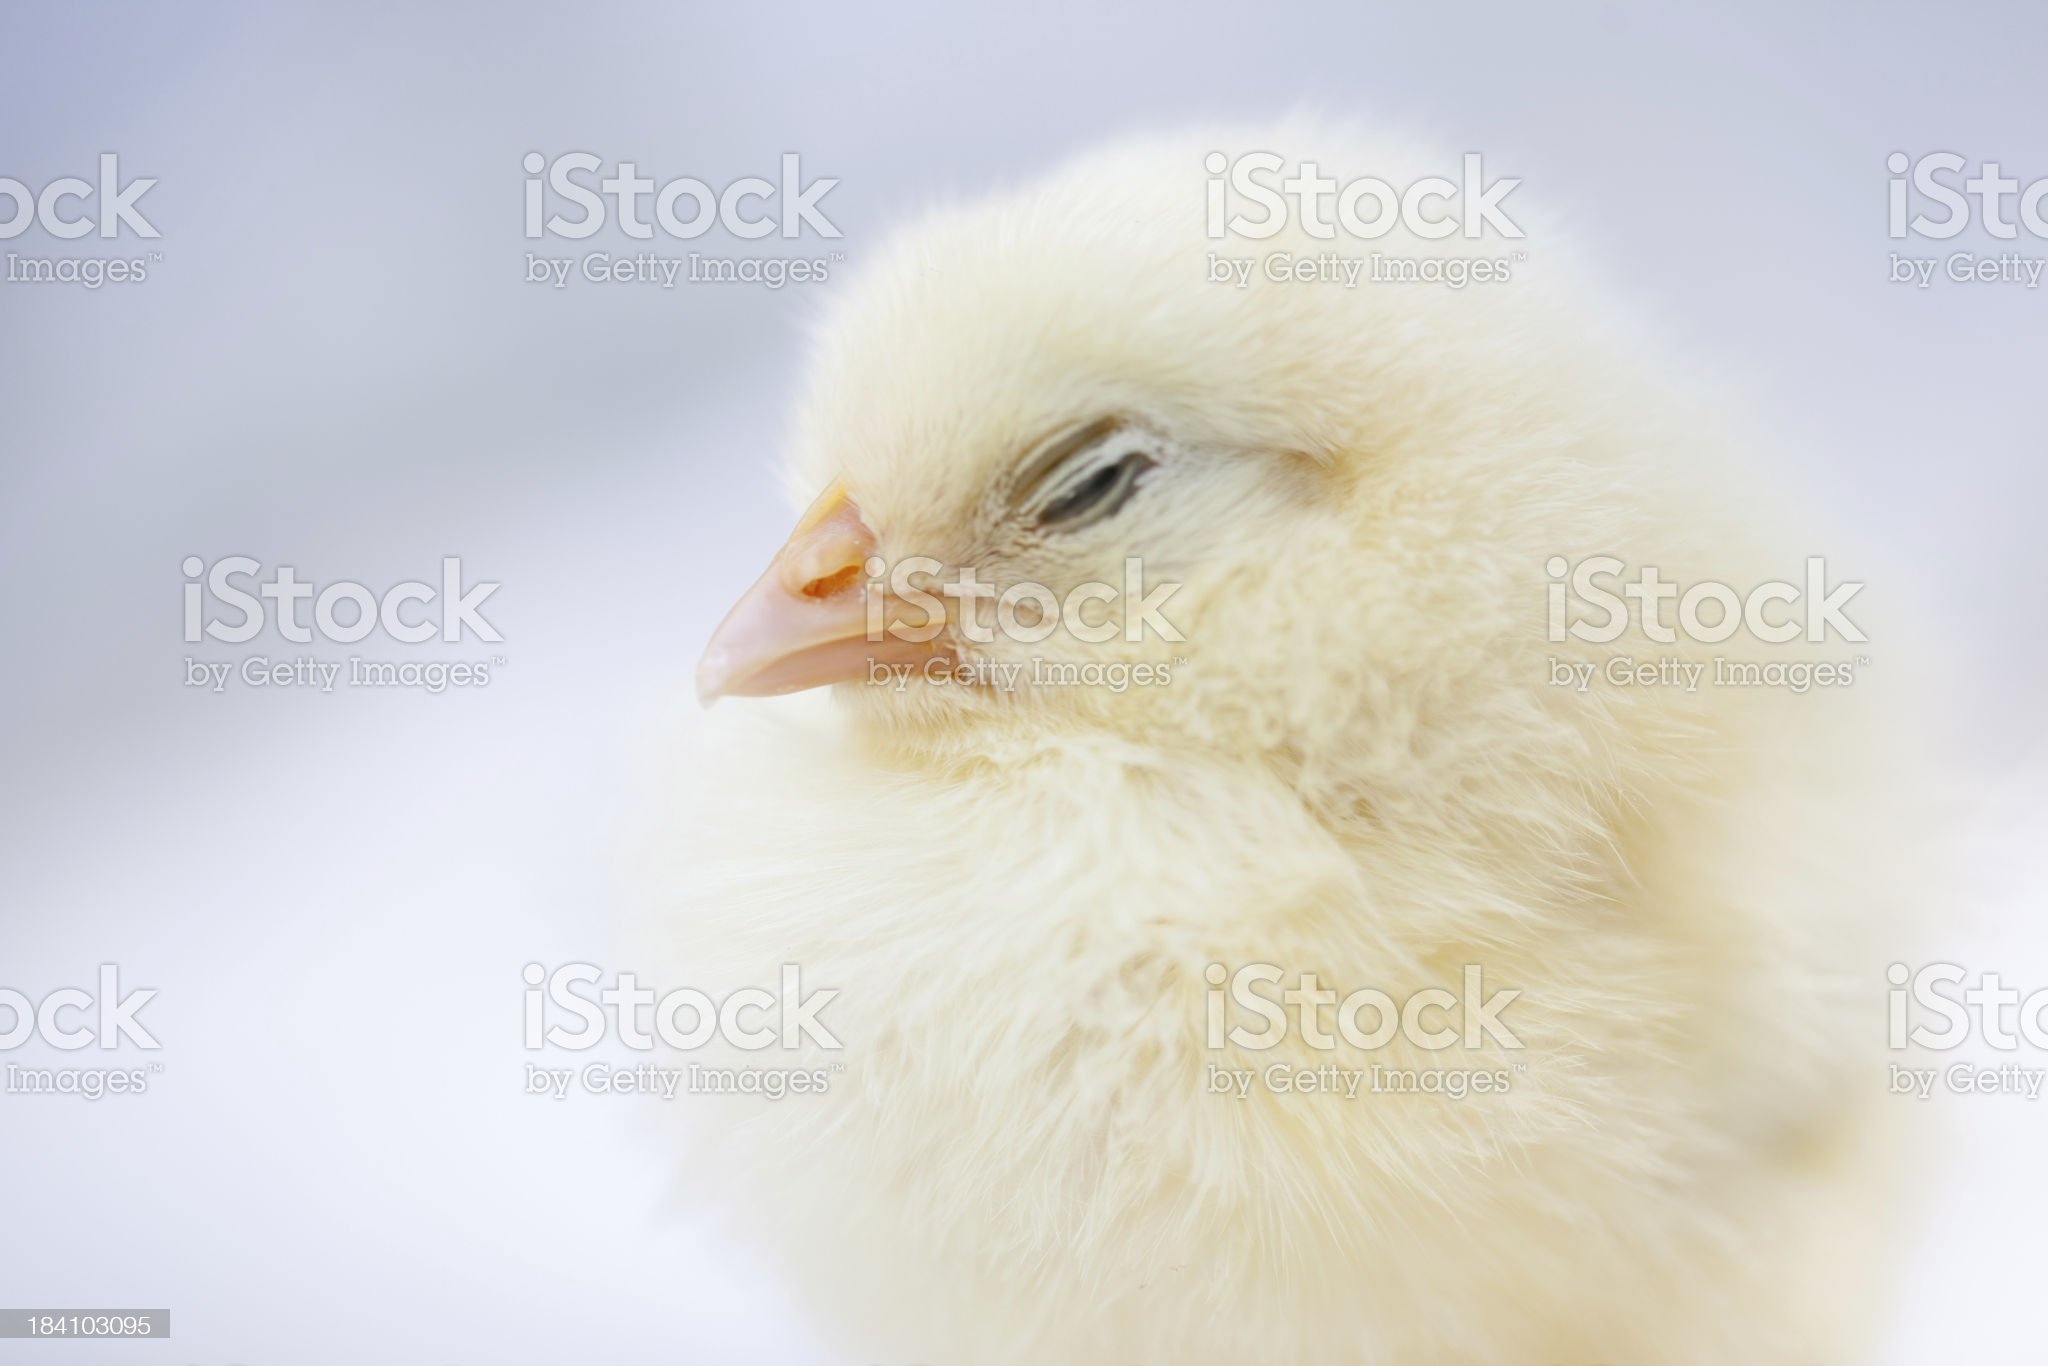 Sleeping baby chicken royalty-free stock photo